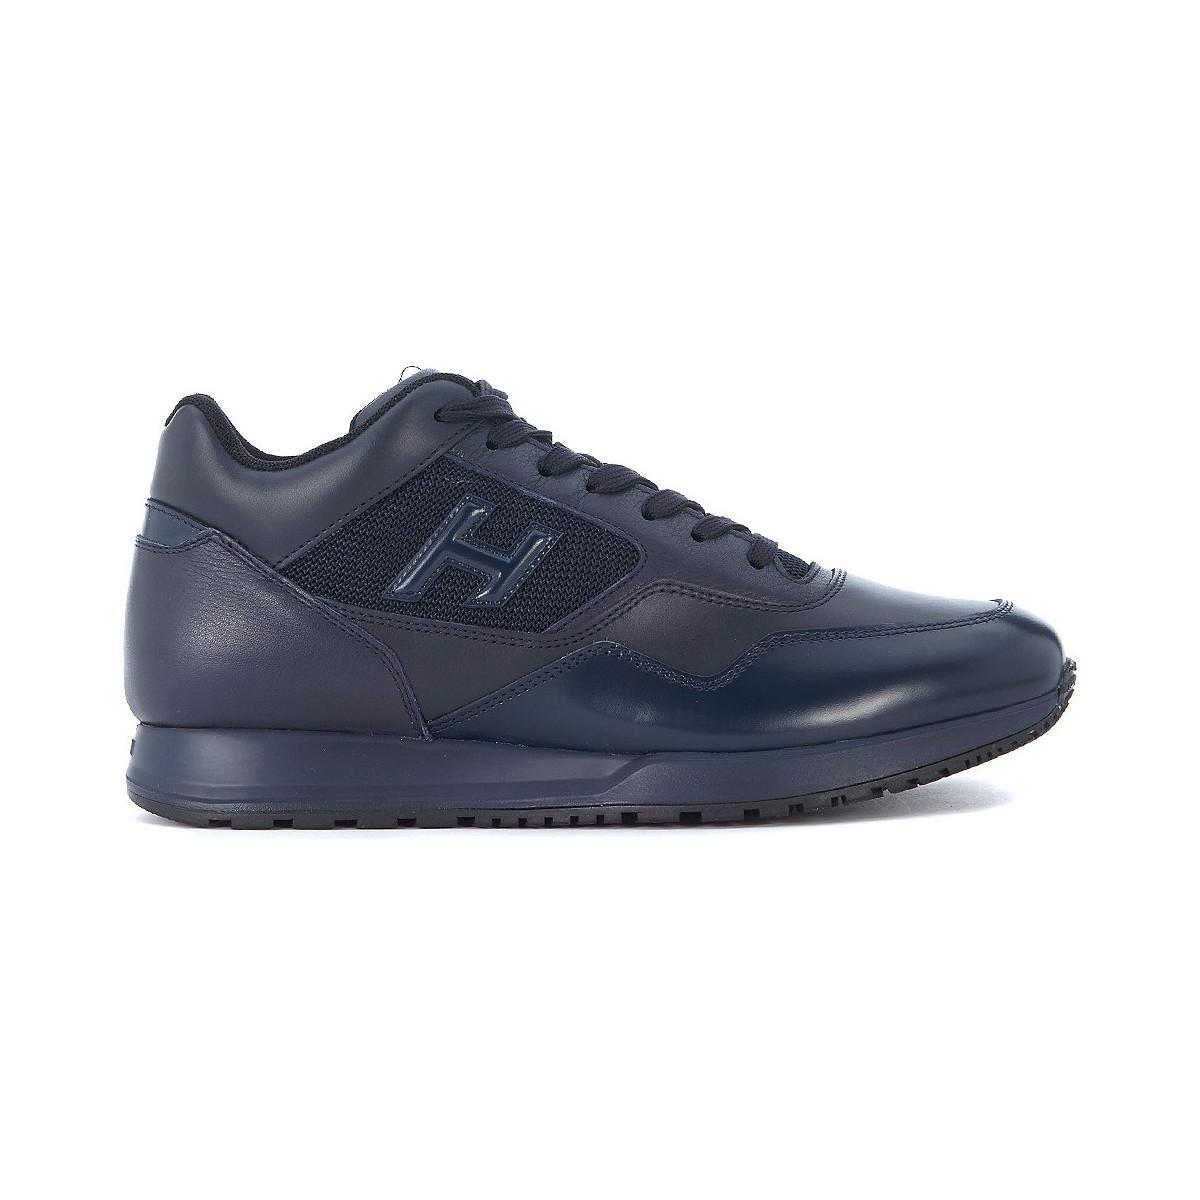 Hogan Sneaker H321 In Pelle E Tessuto Tecnico Blu Men s Shoes ... a7d1b2603f6